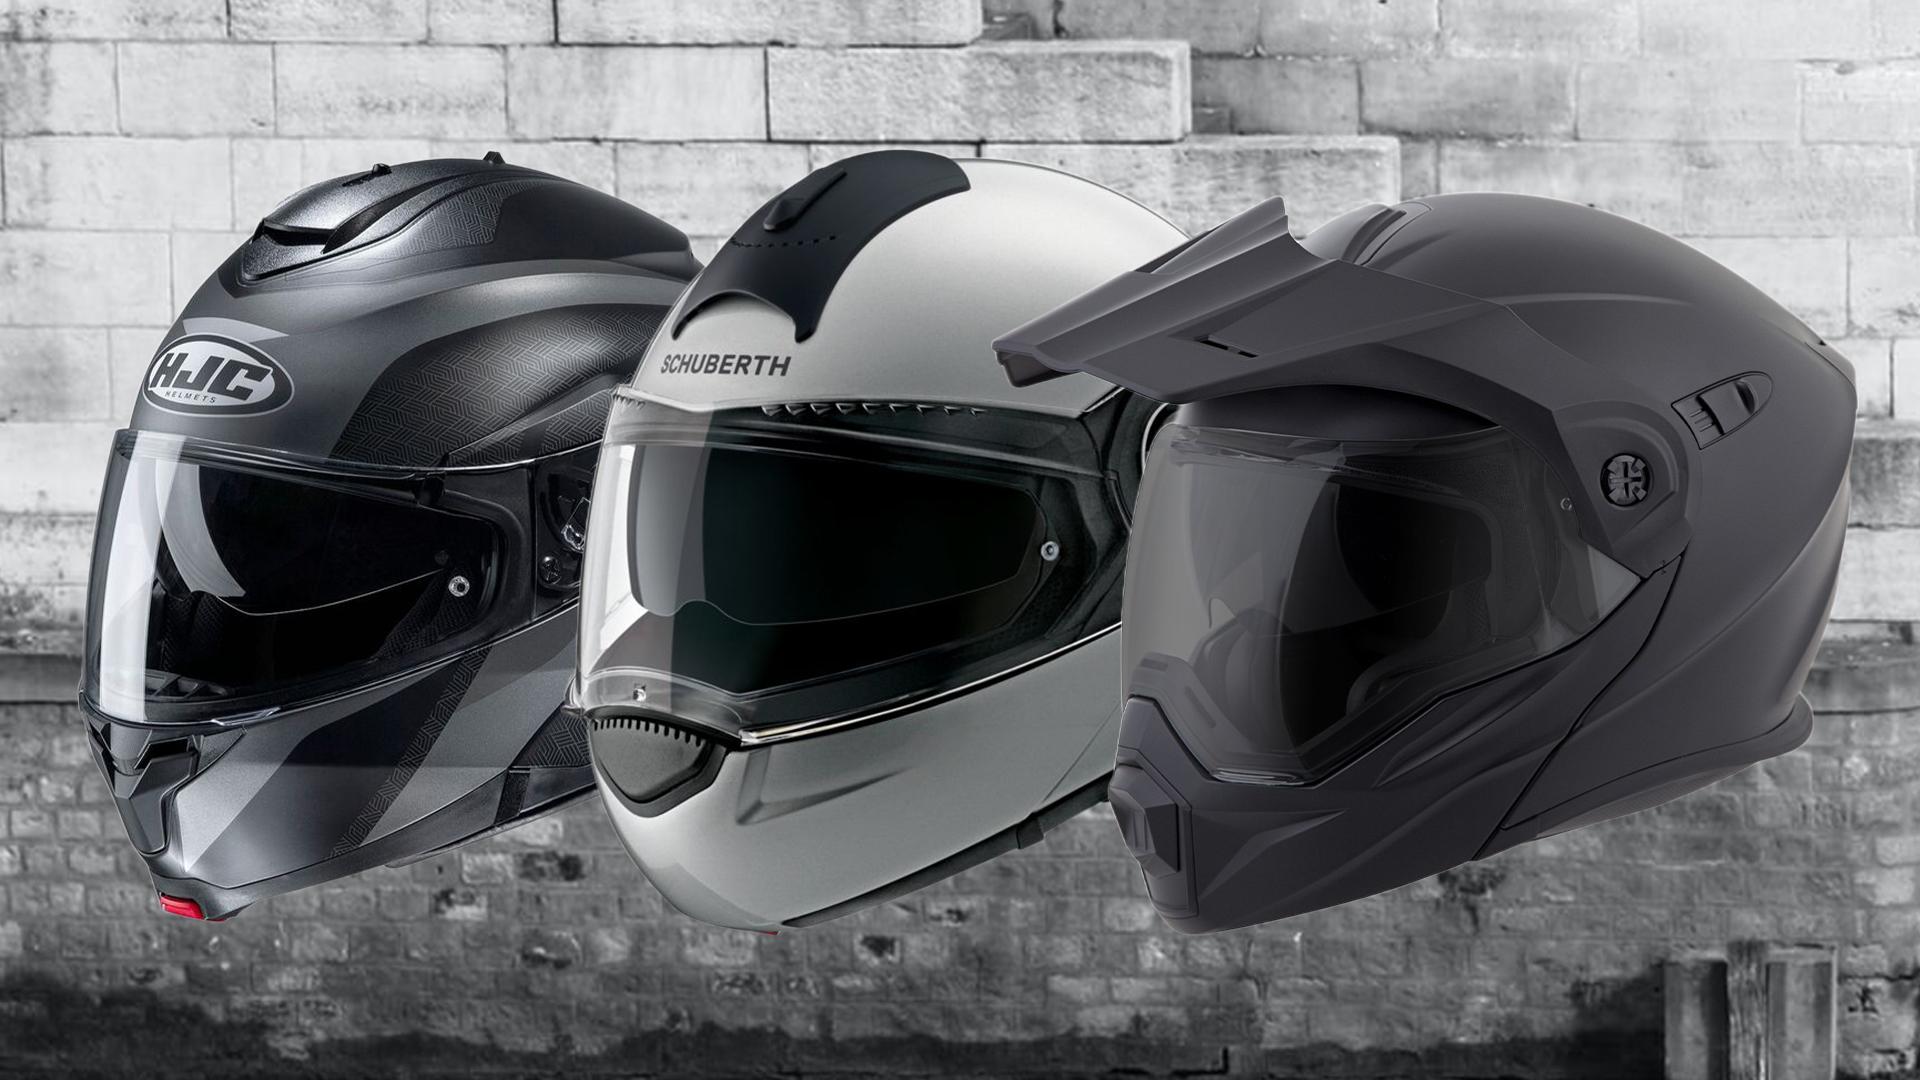 Best Modular Helmets Under 500 for Beginners